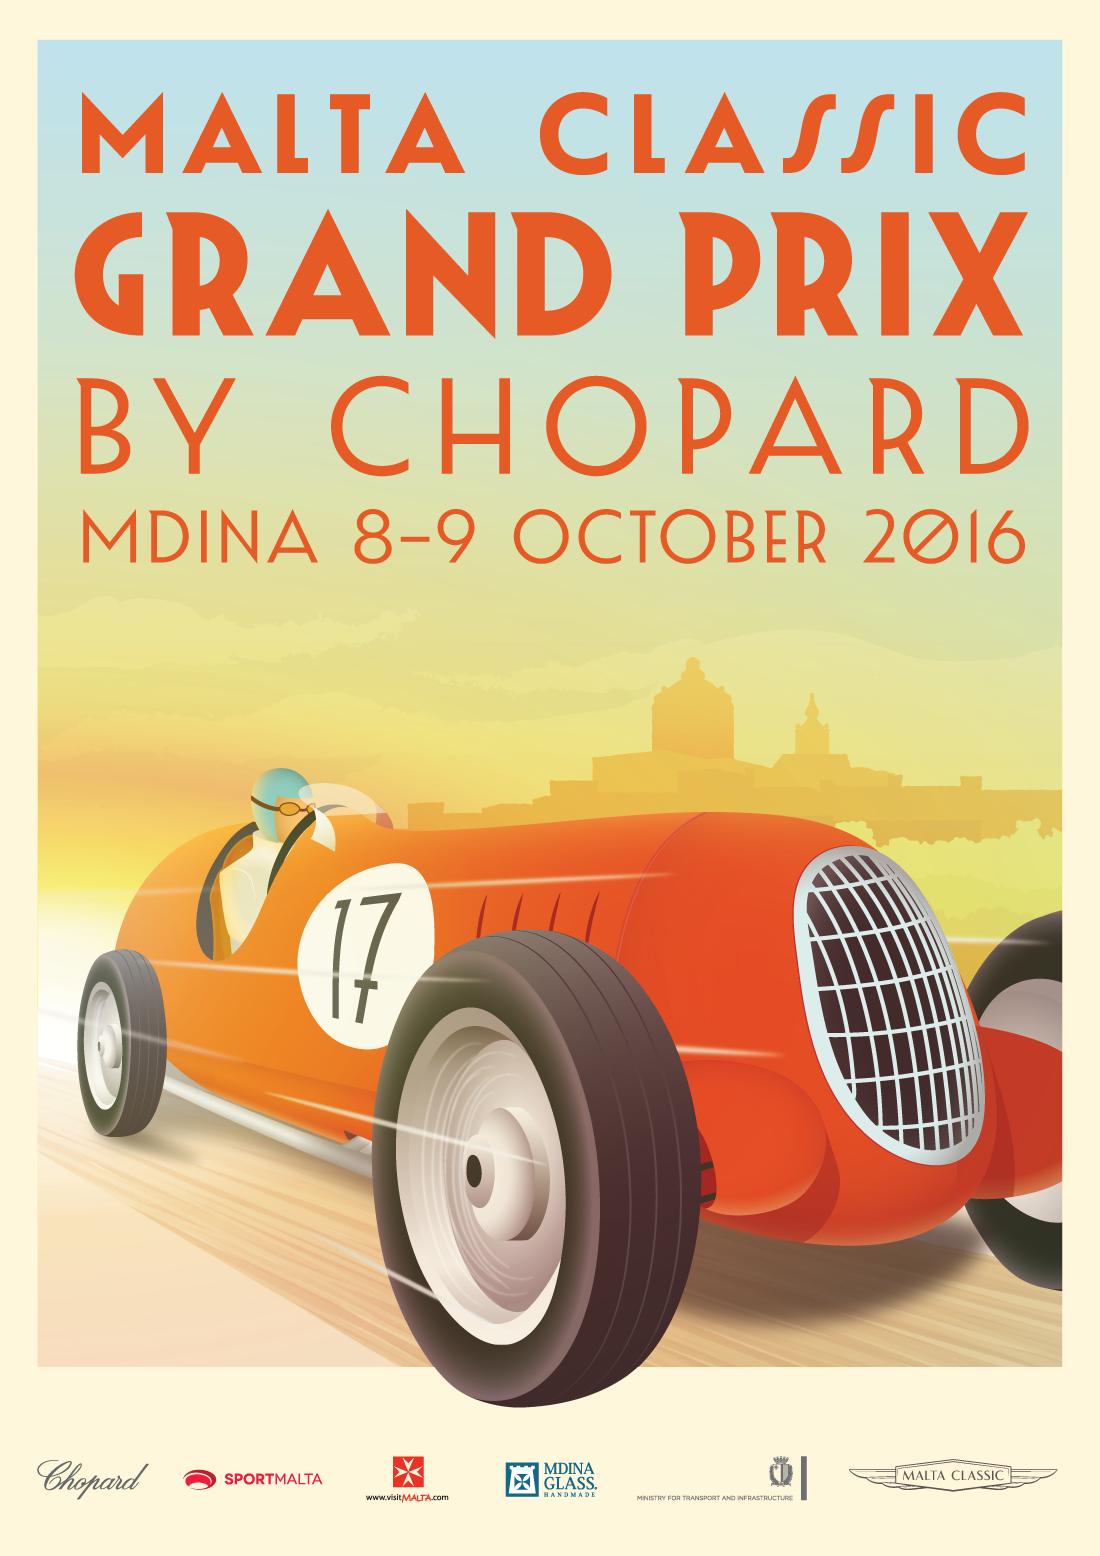 Malta Classic Grand Prix by Chopard flyer